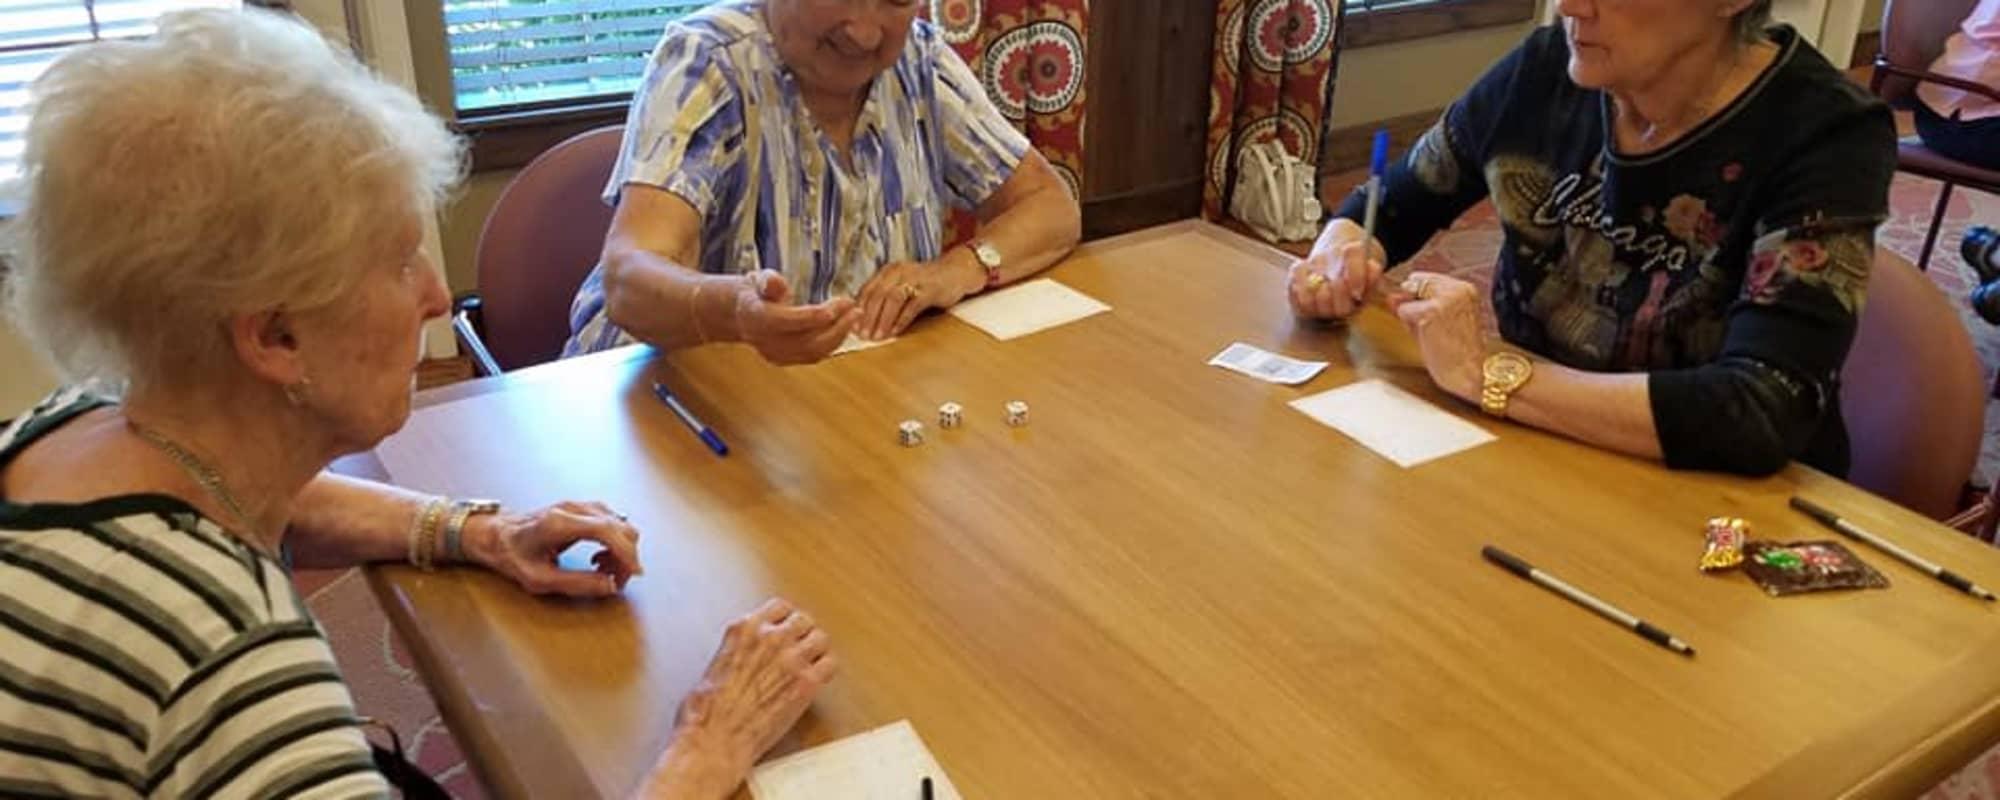 Residents playing board games at Oakmont Gardens in Santa Rosa, California